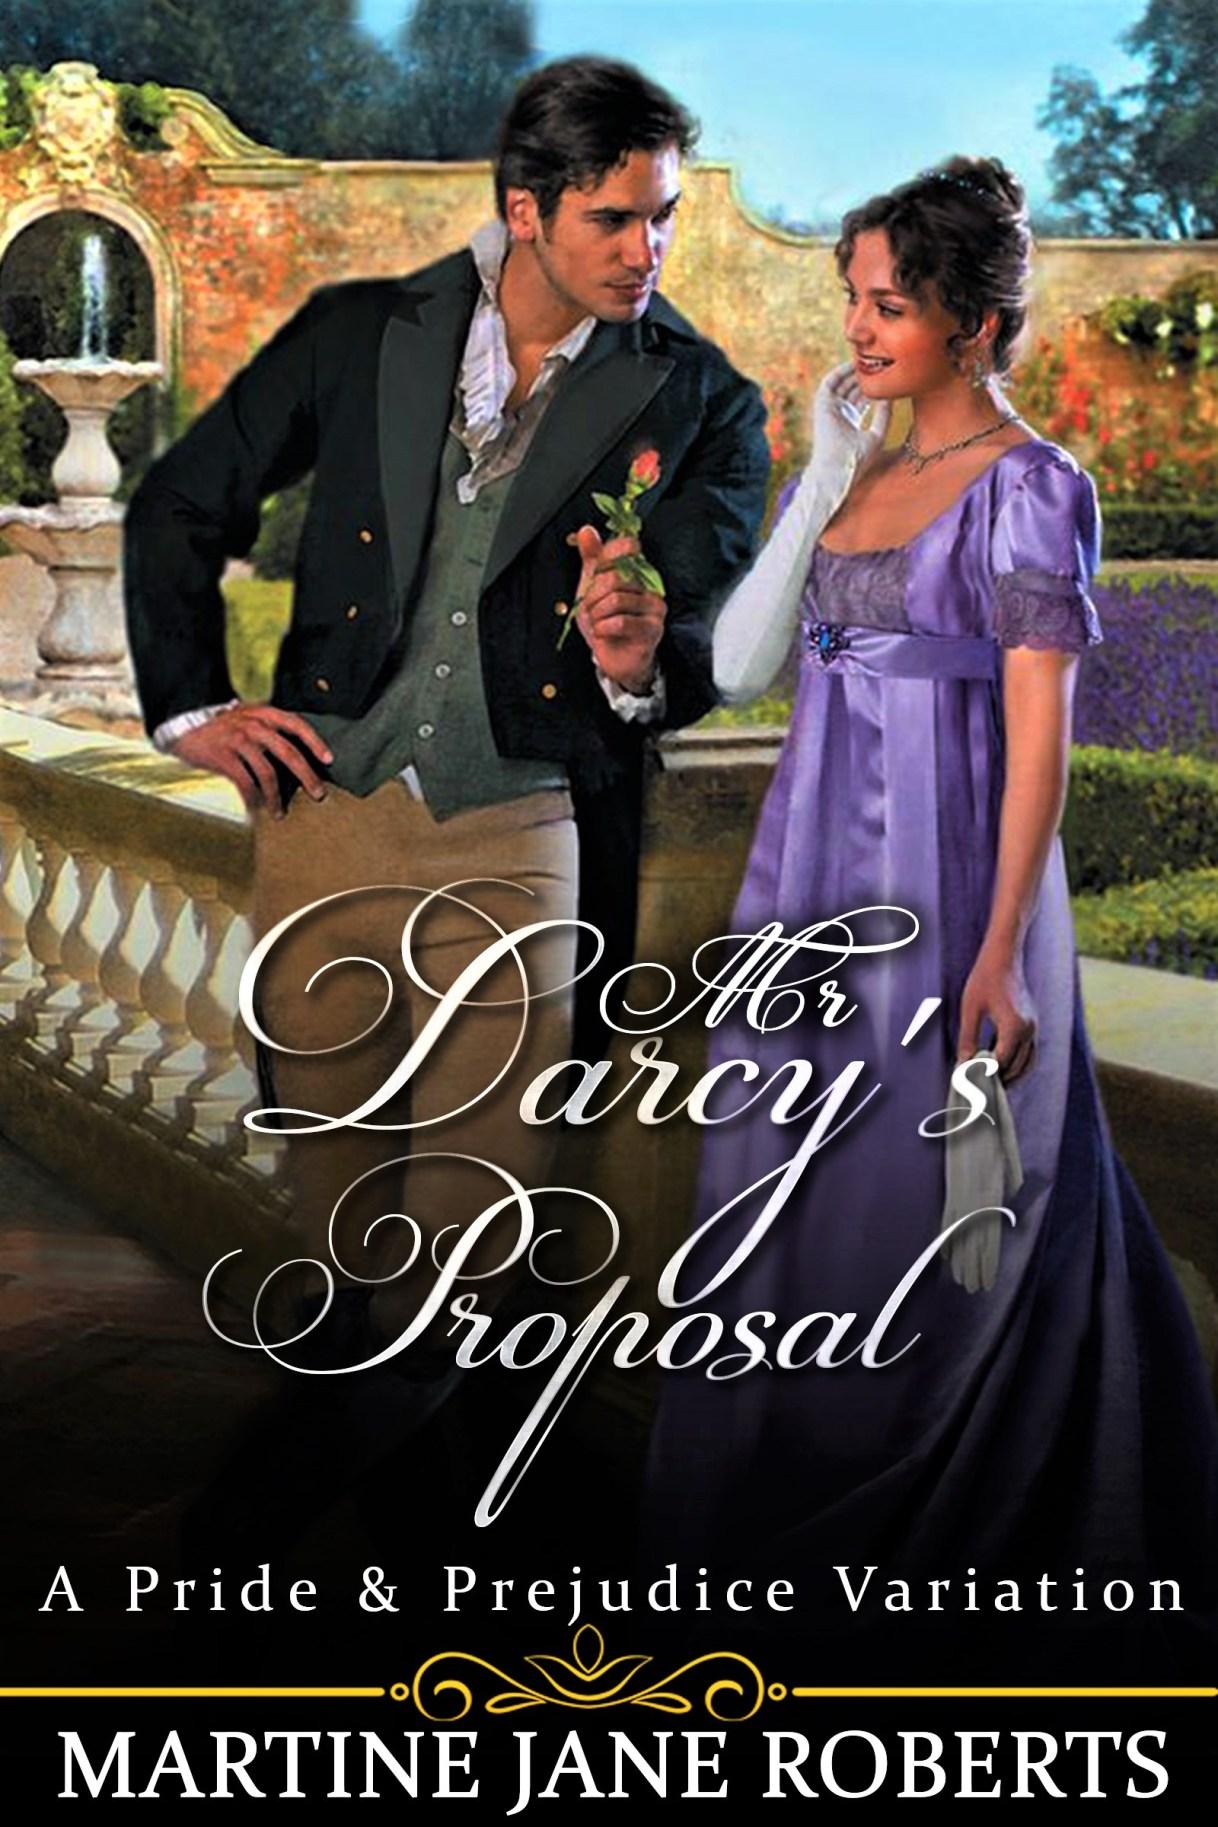 Mr Darcy's Proposal: A Pride & Prejudice Variation byMartine Jane Roberts